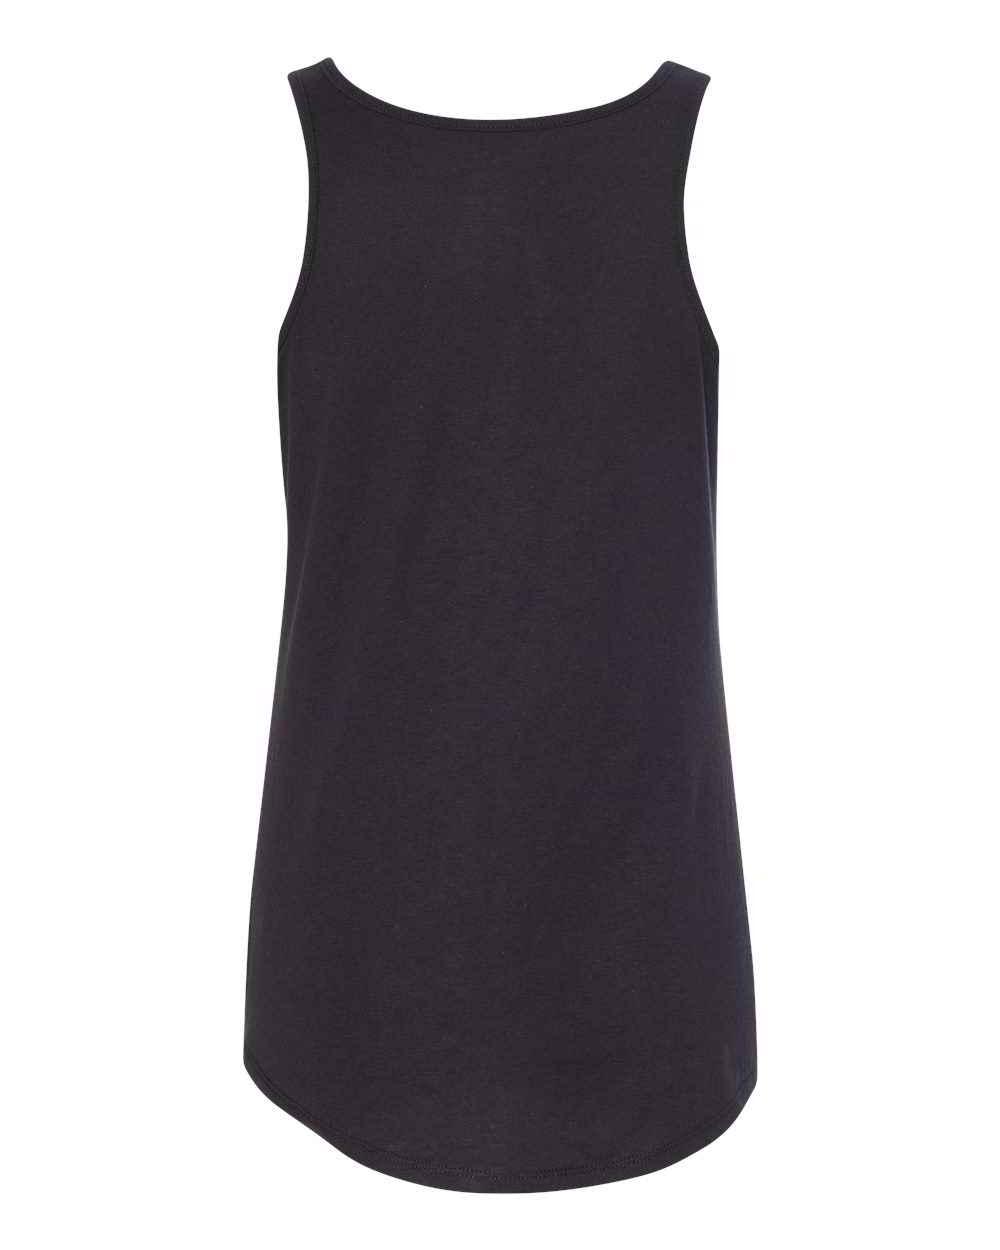 Hanes-Ladies-Moisture-Wicking-Shirts-Sleeveless-X-Temp-Women-039-s-Tank-Top thumbnail 4